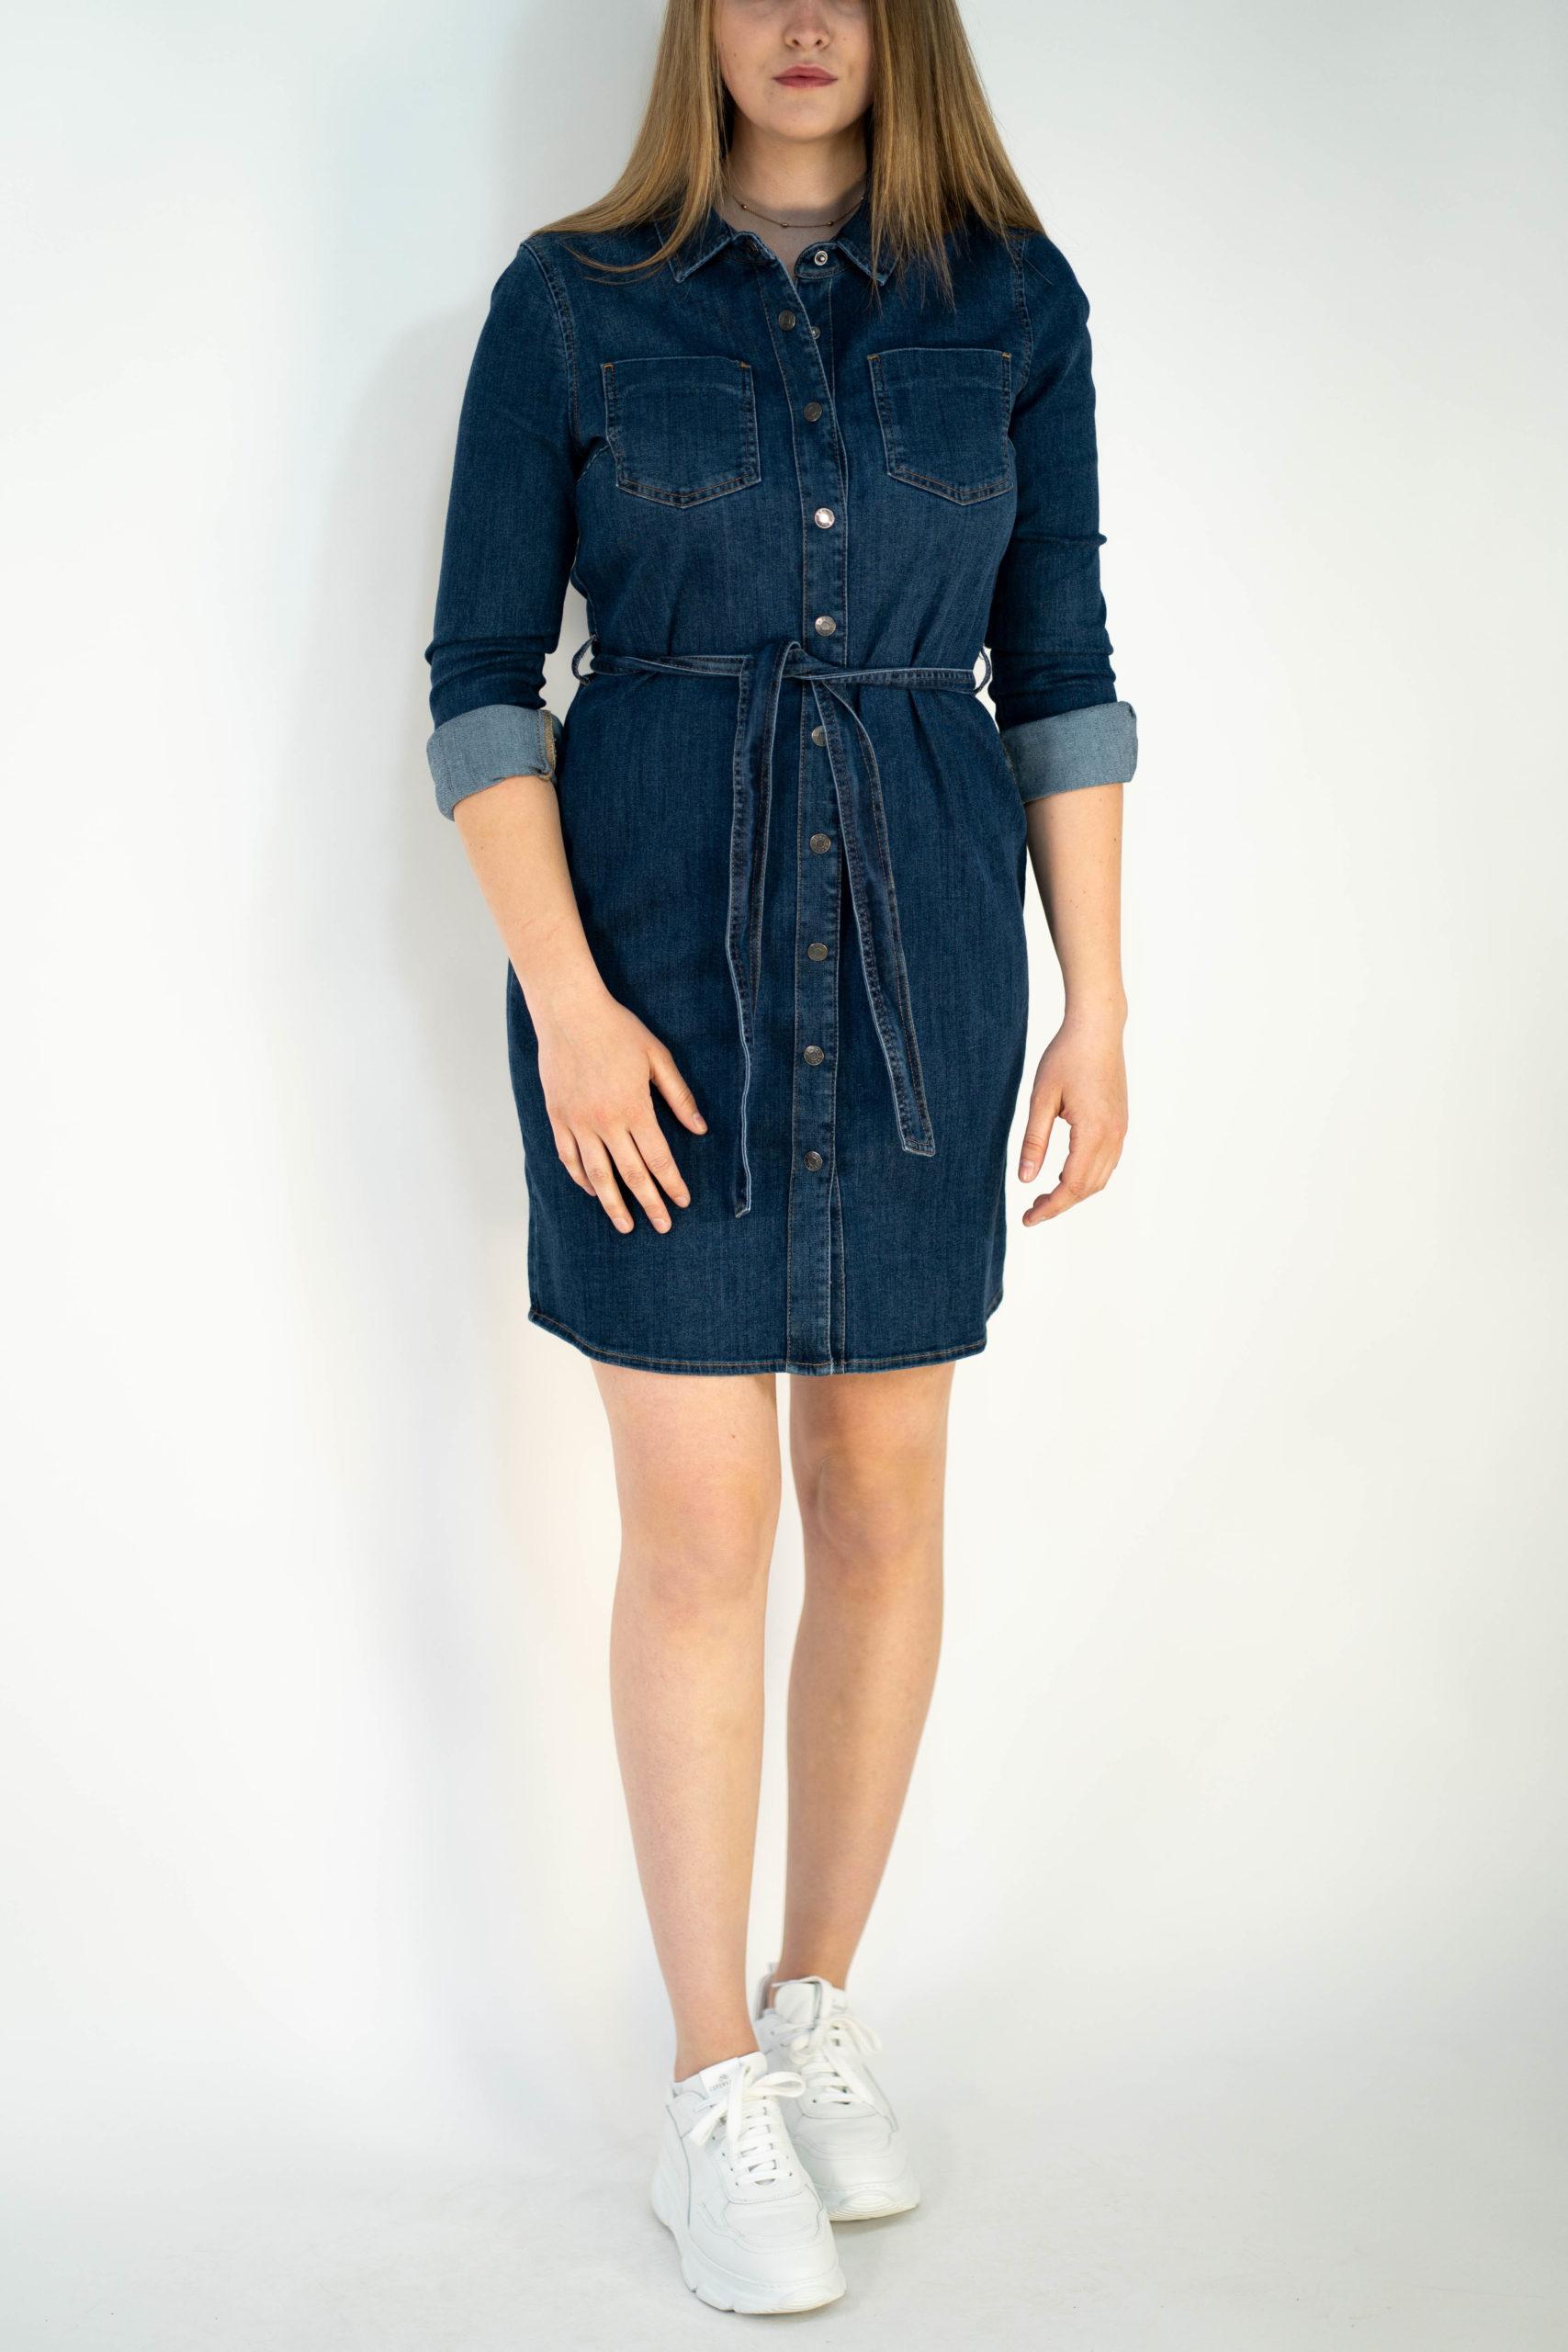 Esprit Hemdblusen Jeanskleid In Denim  Steingrube Mode